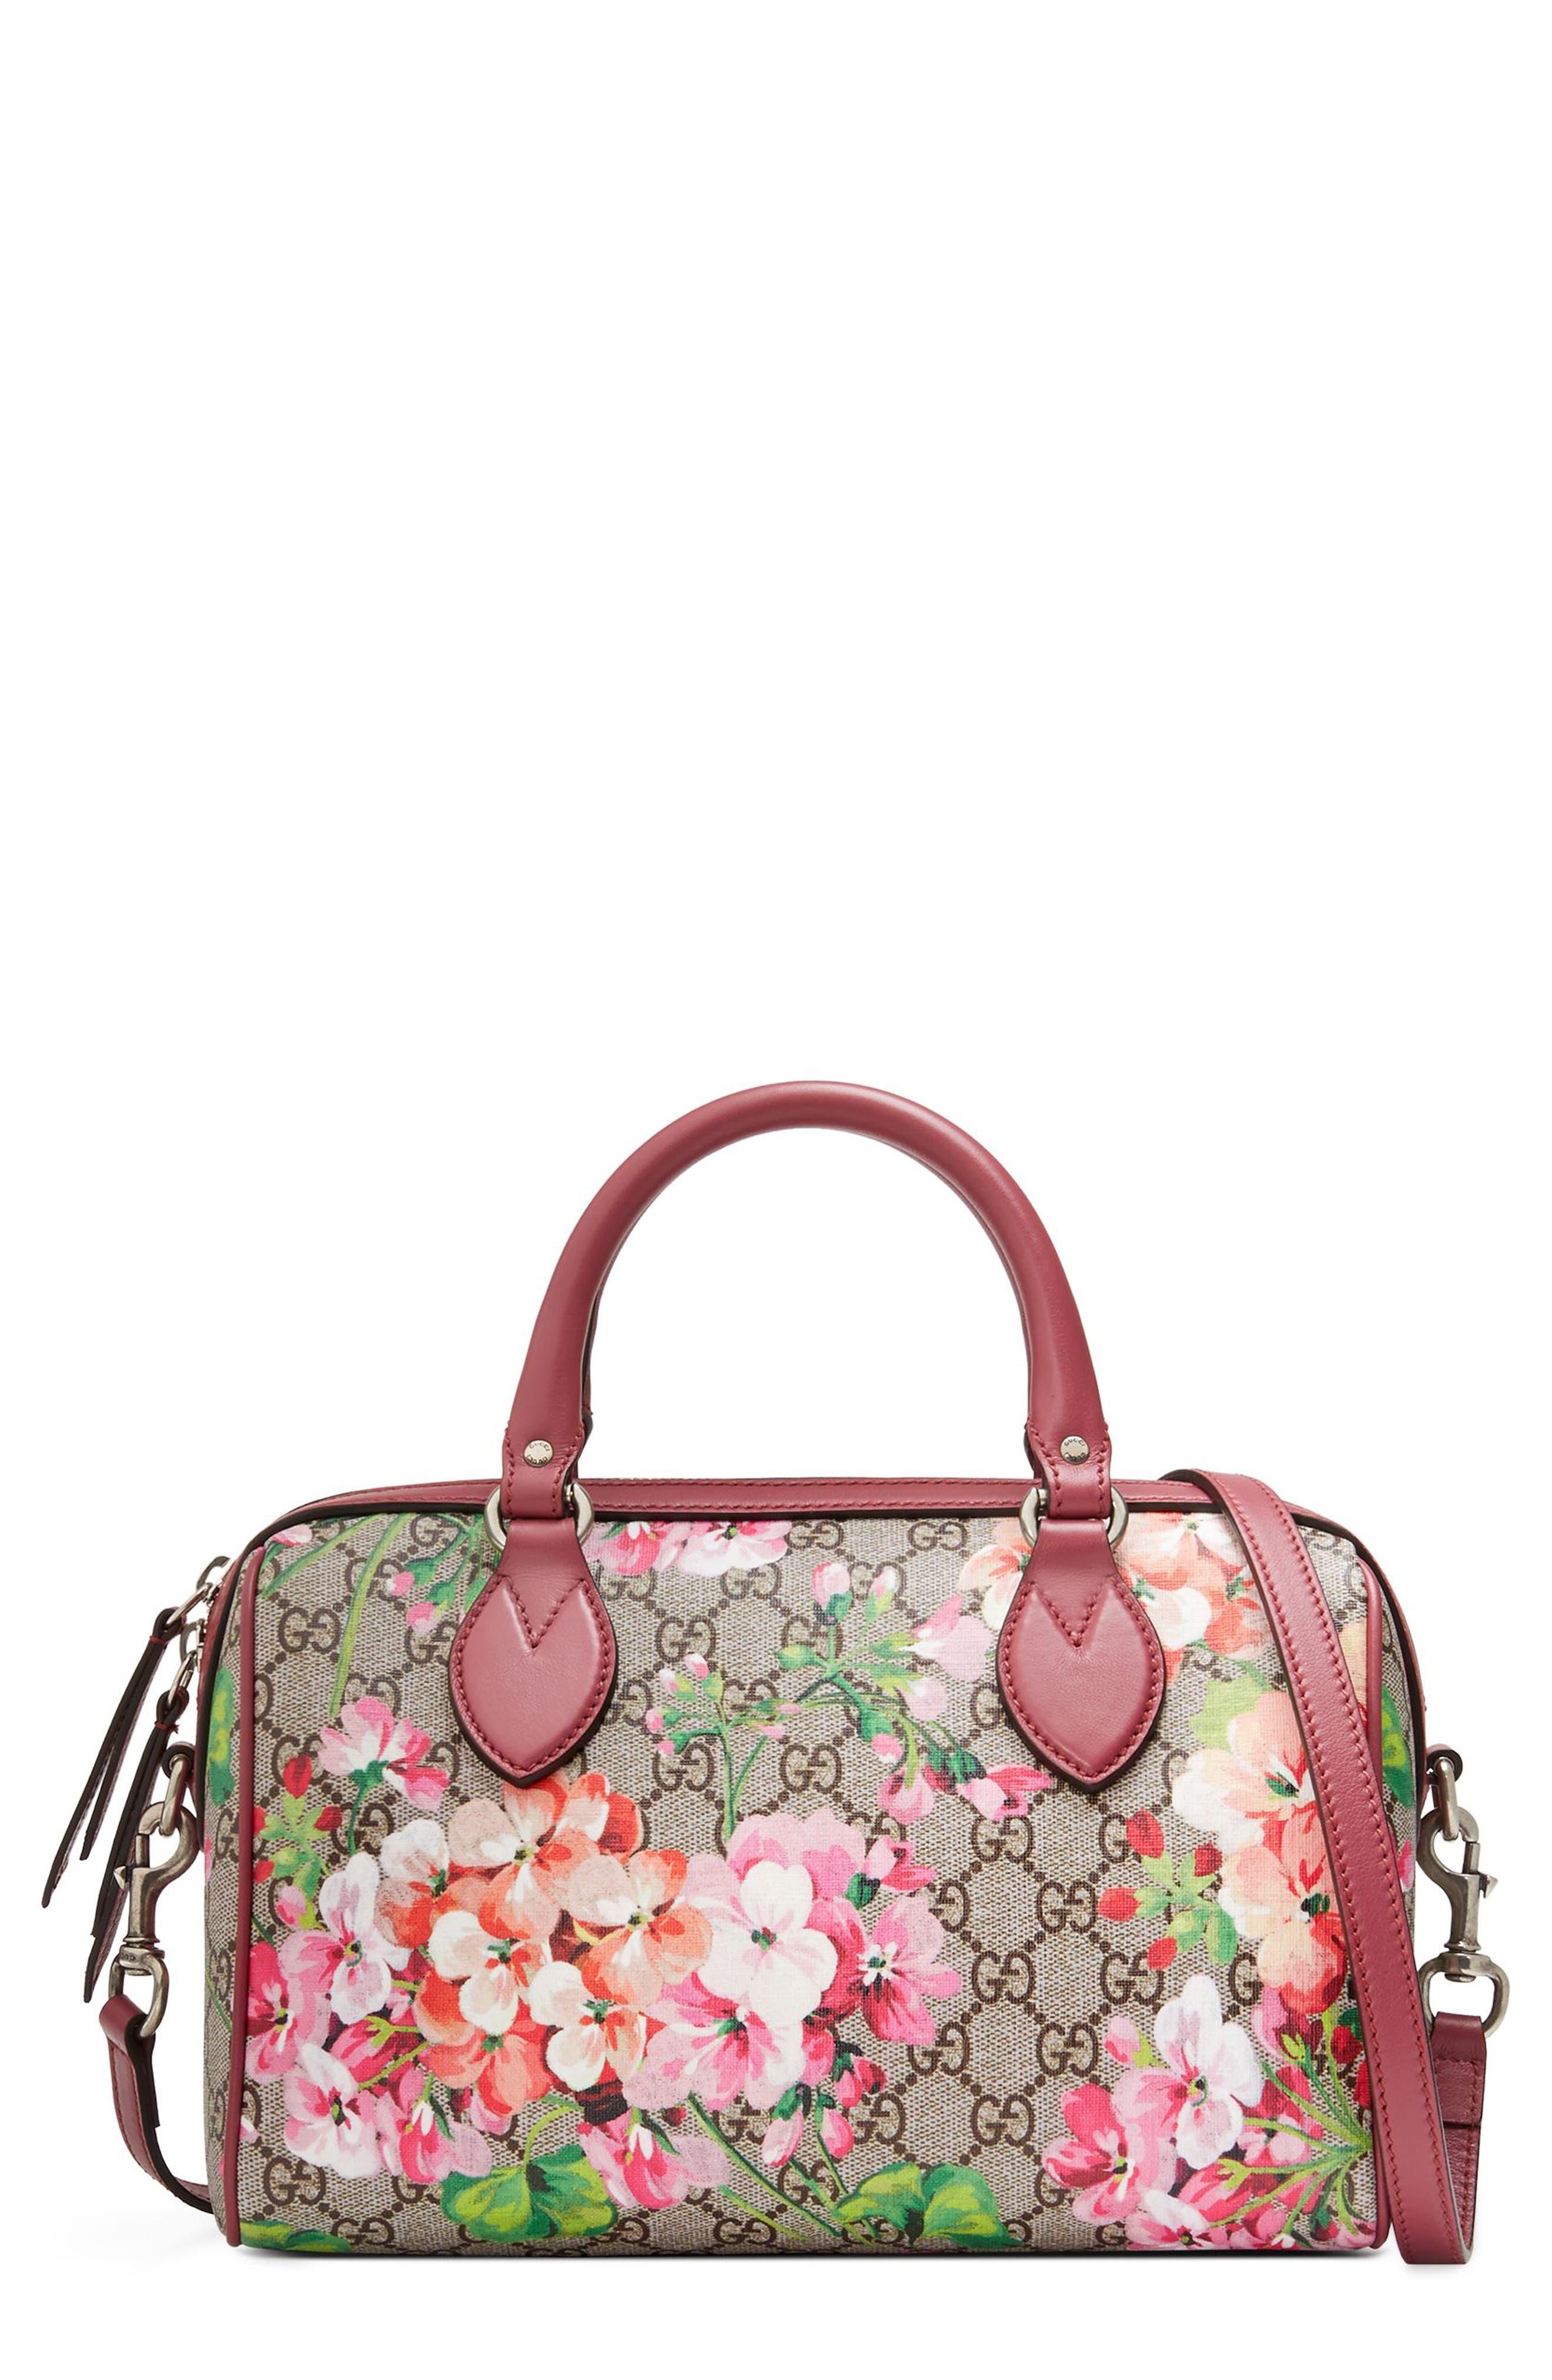 Main Image - Gucci Small Blooms Top Handle GG Supreme Canvas Bag